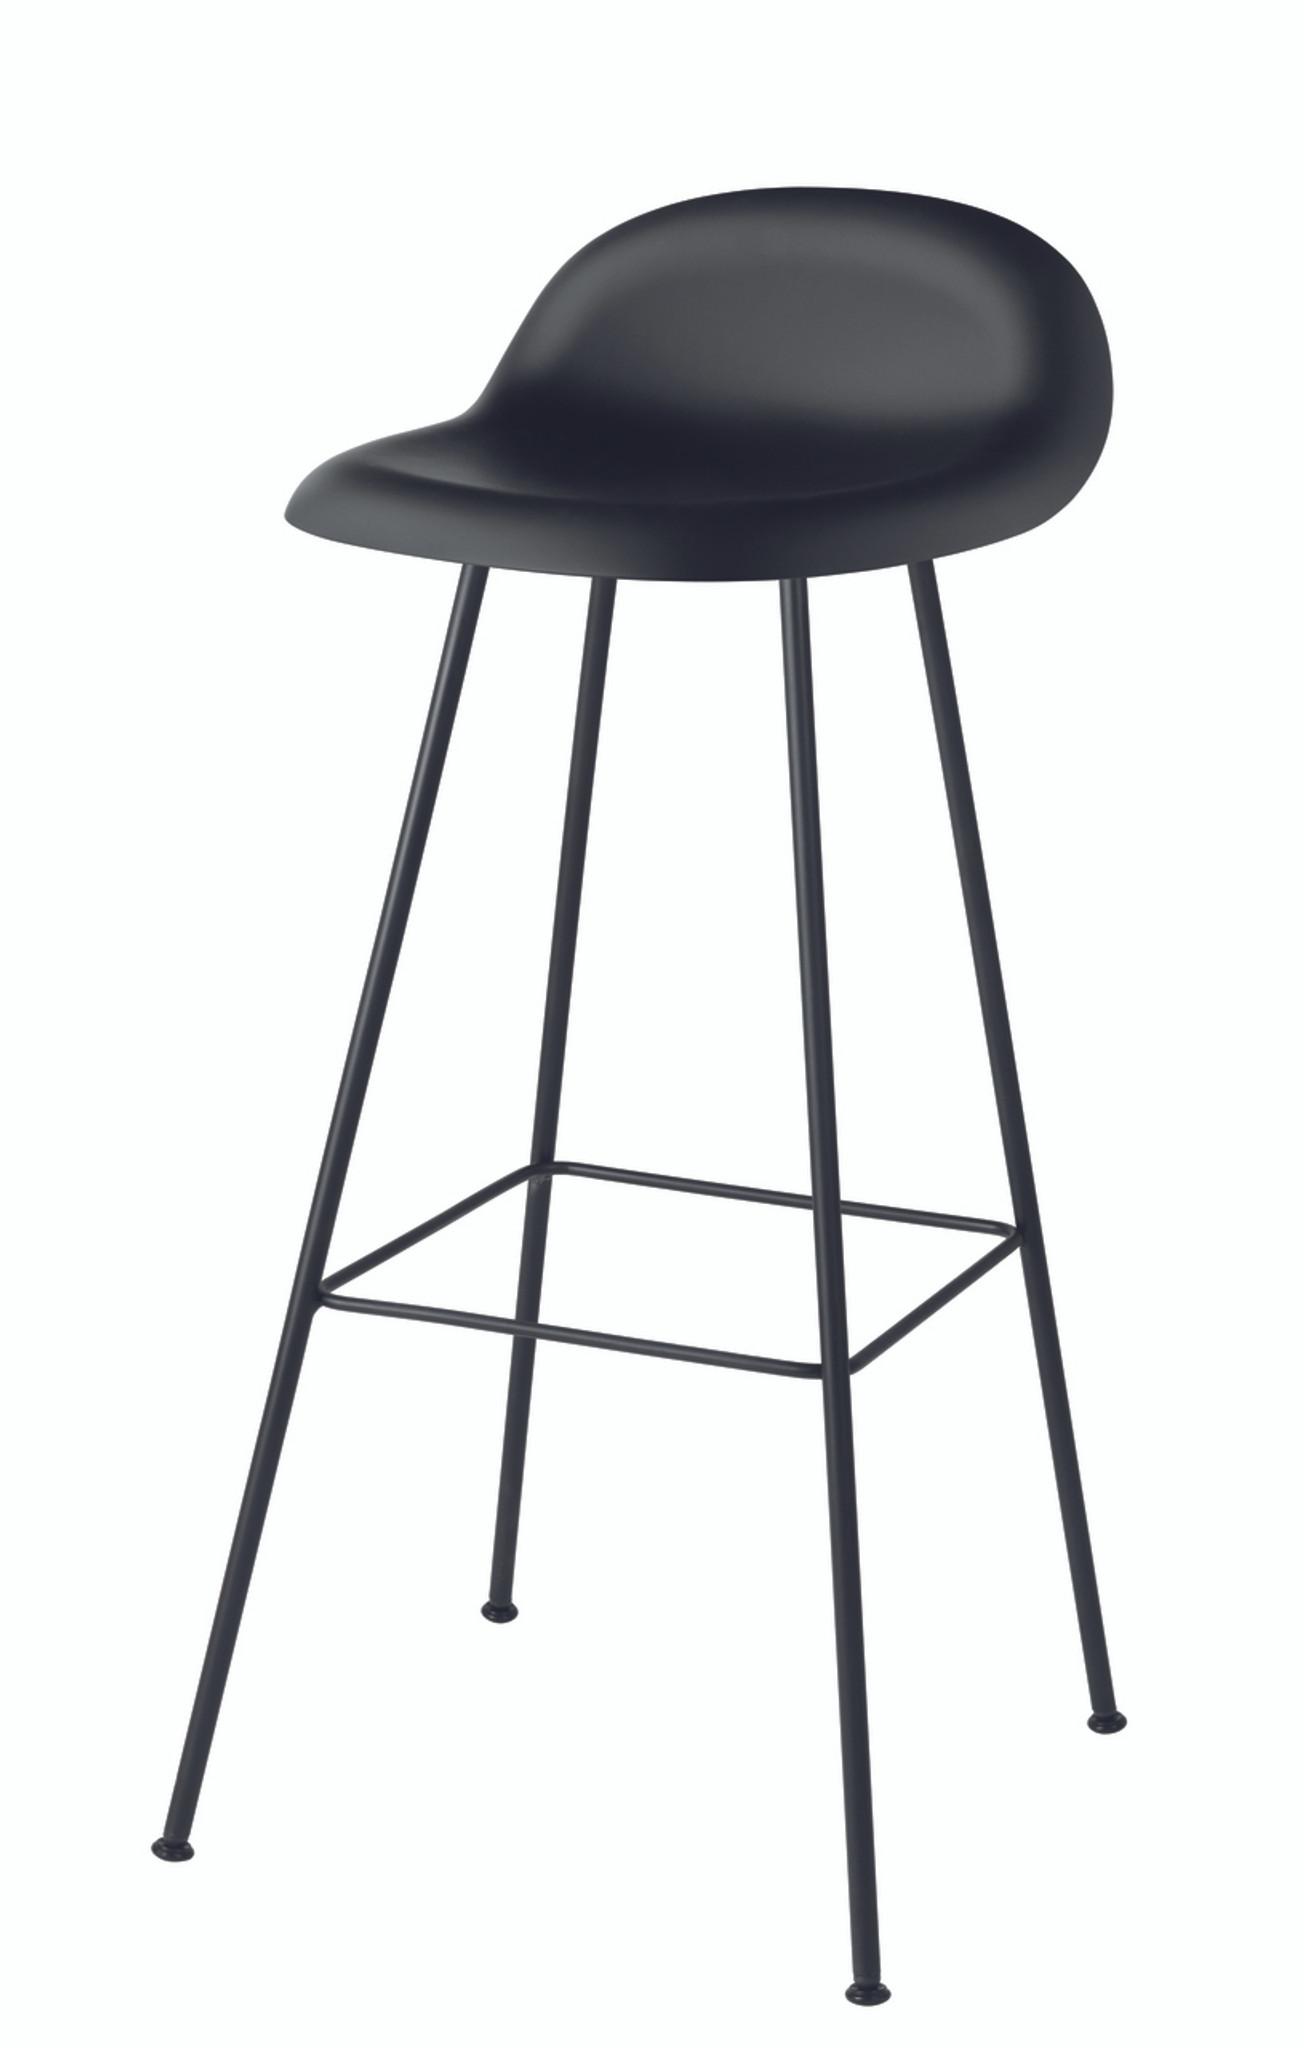 Gubi 3d black bar stool with wire base